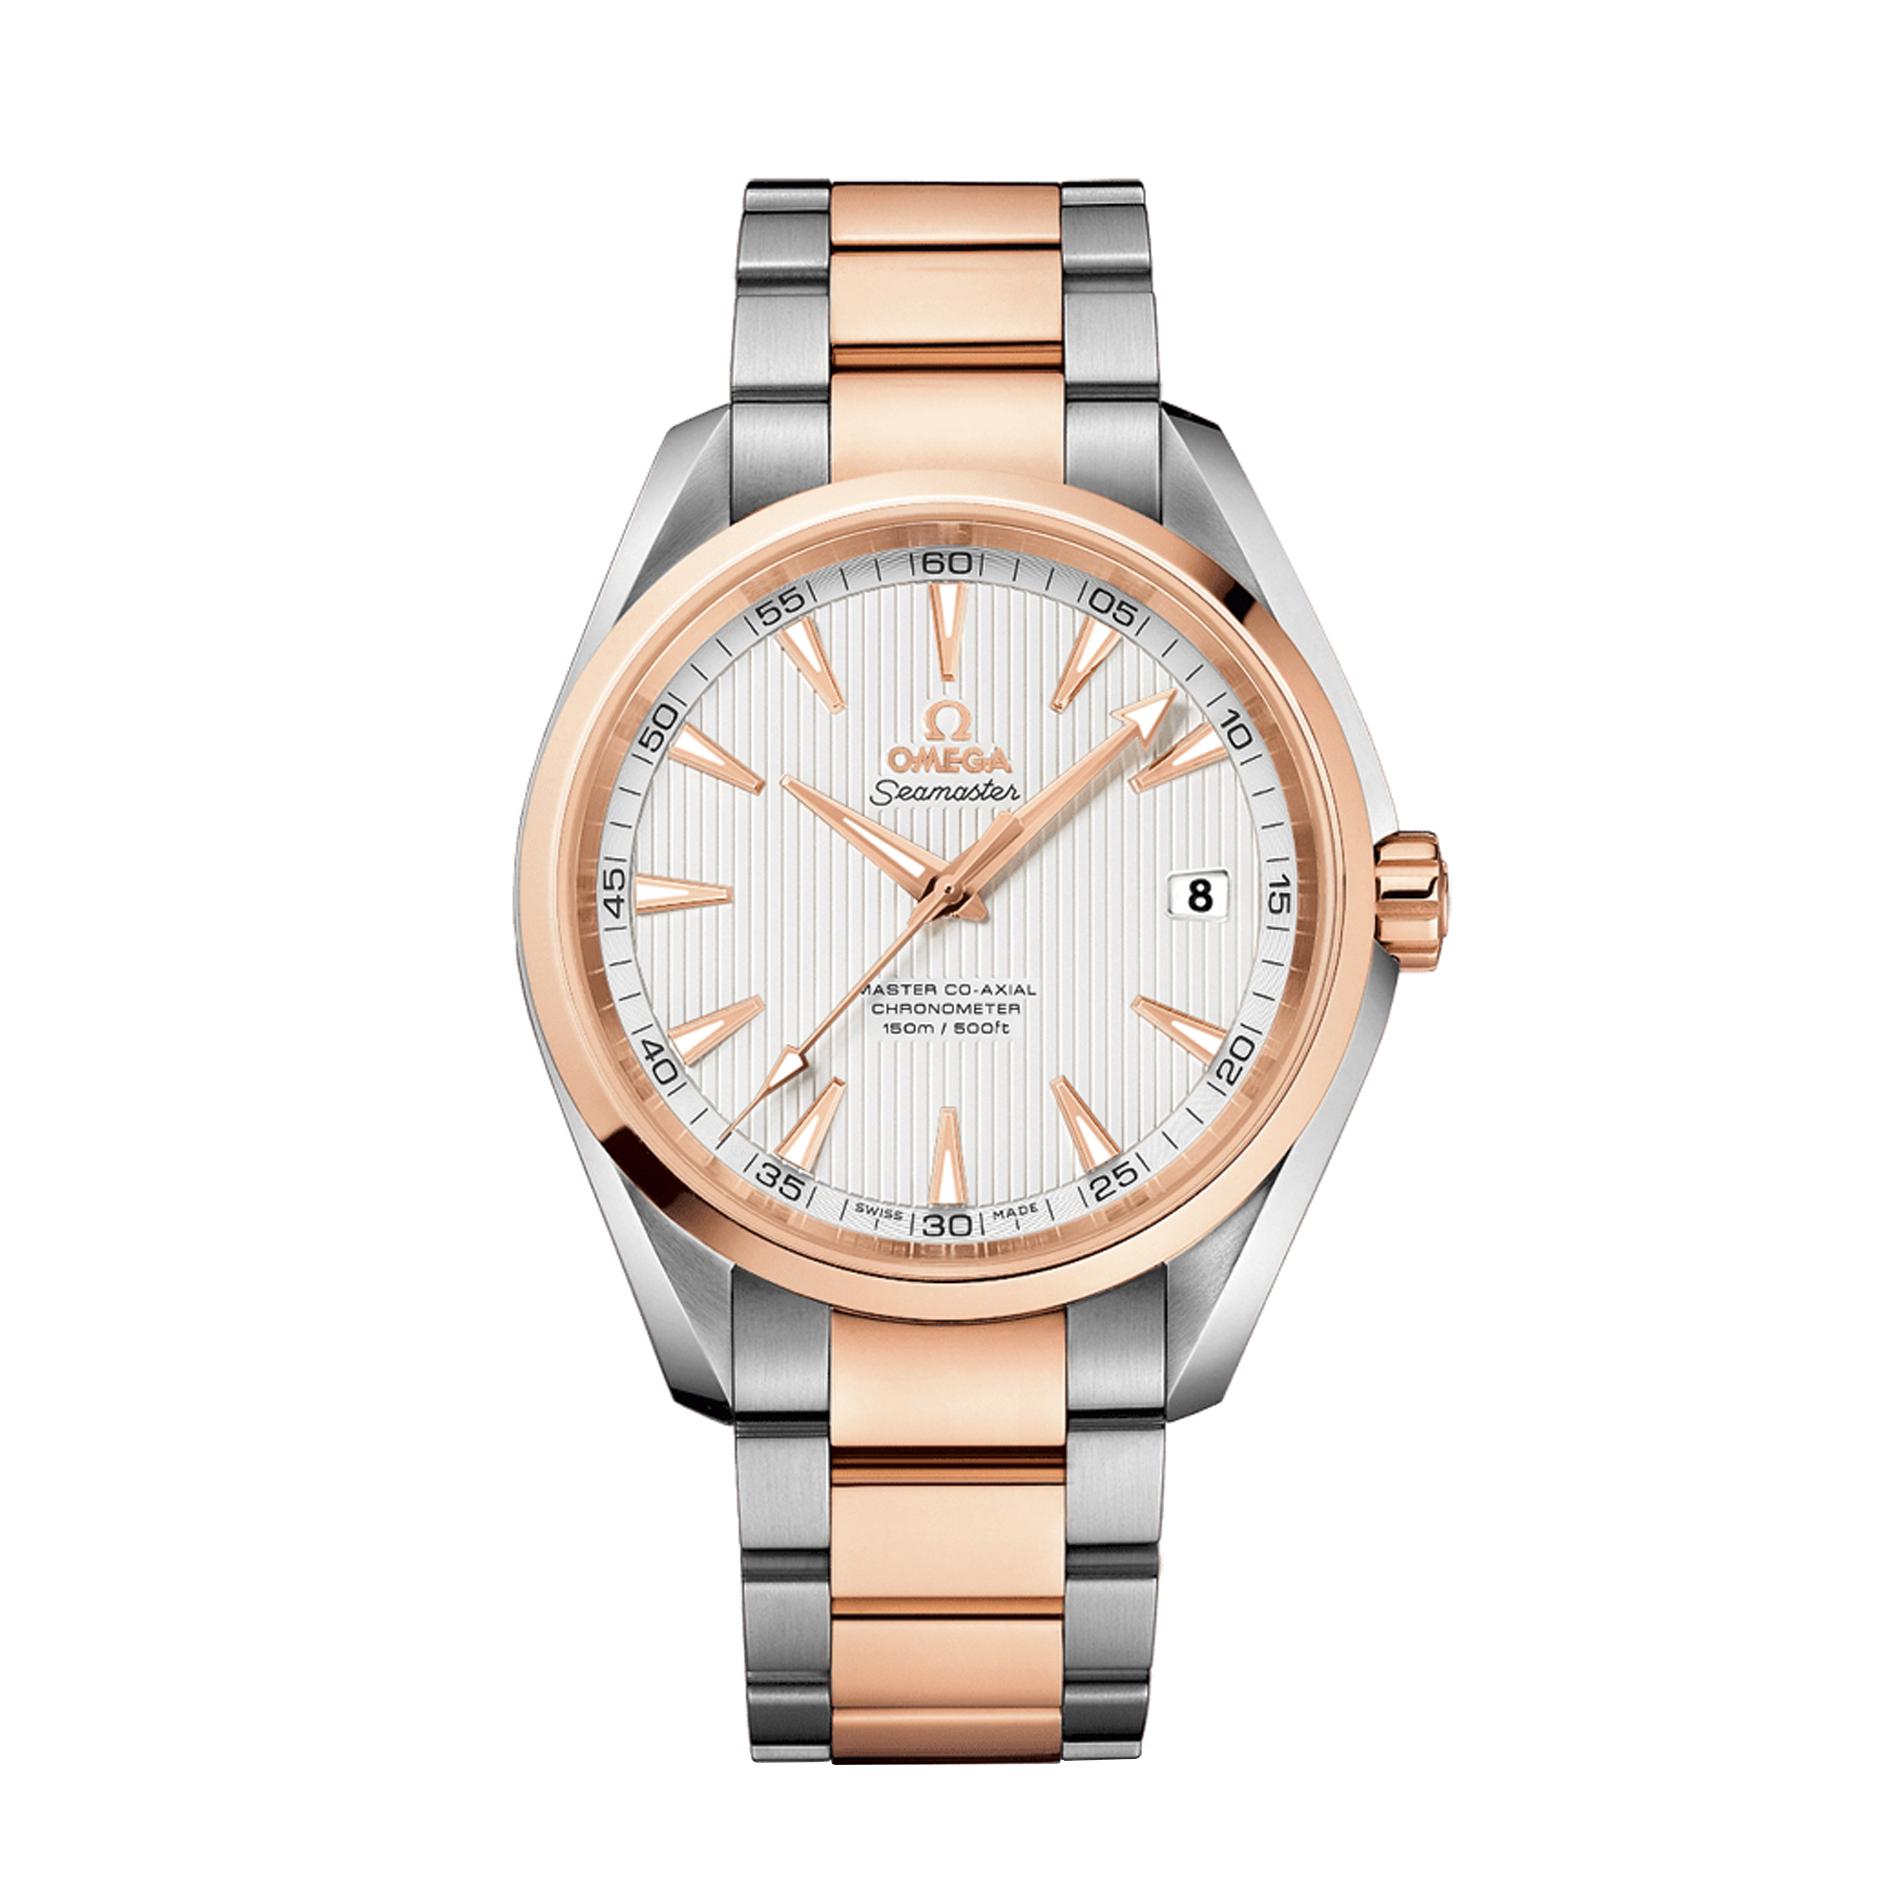 Reloj Omega – Aqua Terra 150M Master Co-Axial 41,5 - Amaya Joyeros